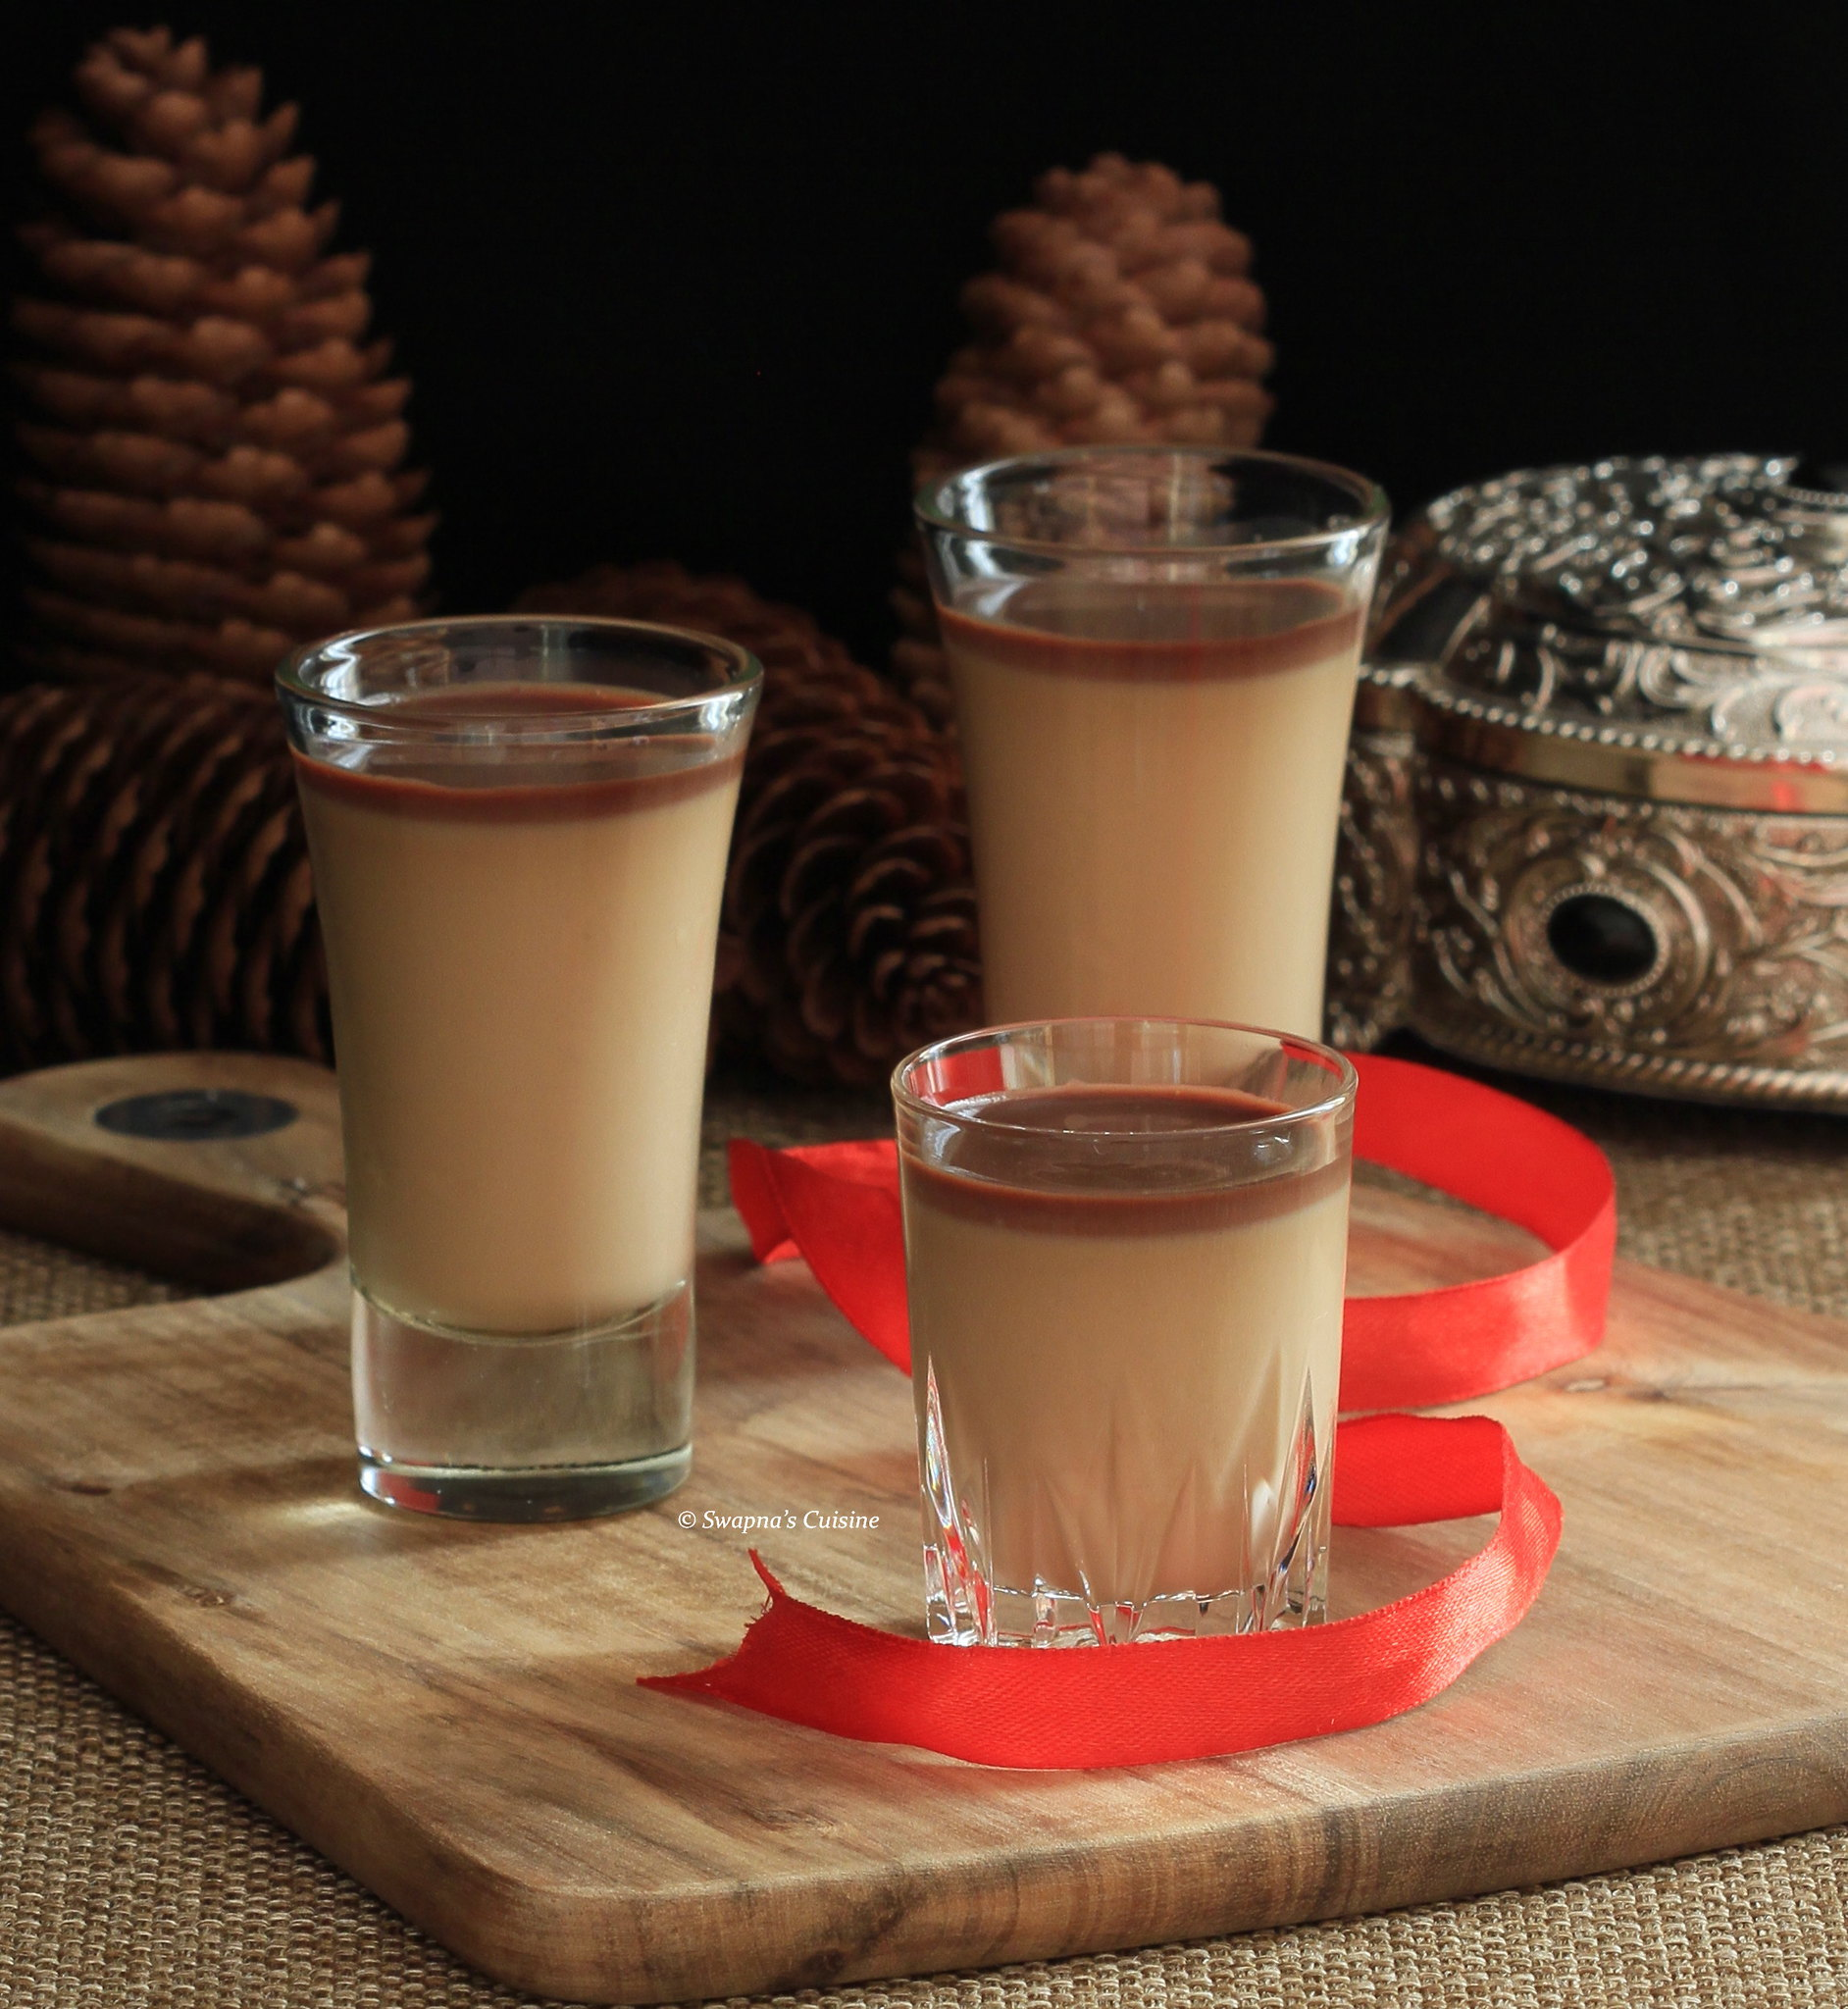 Swapna's Cuisine: Espresso Panna Cotta